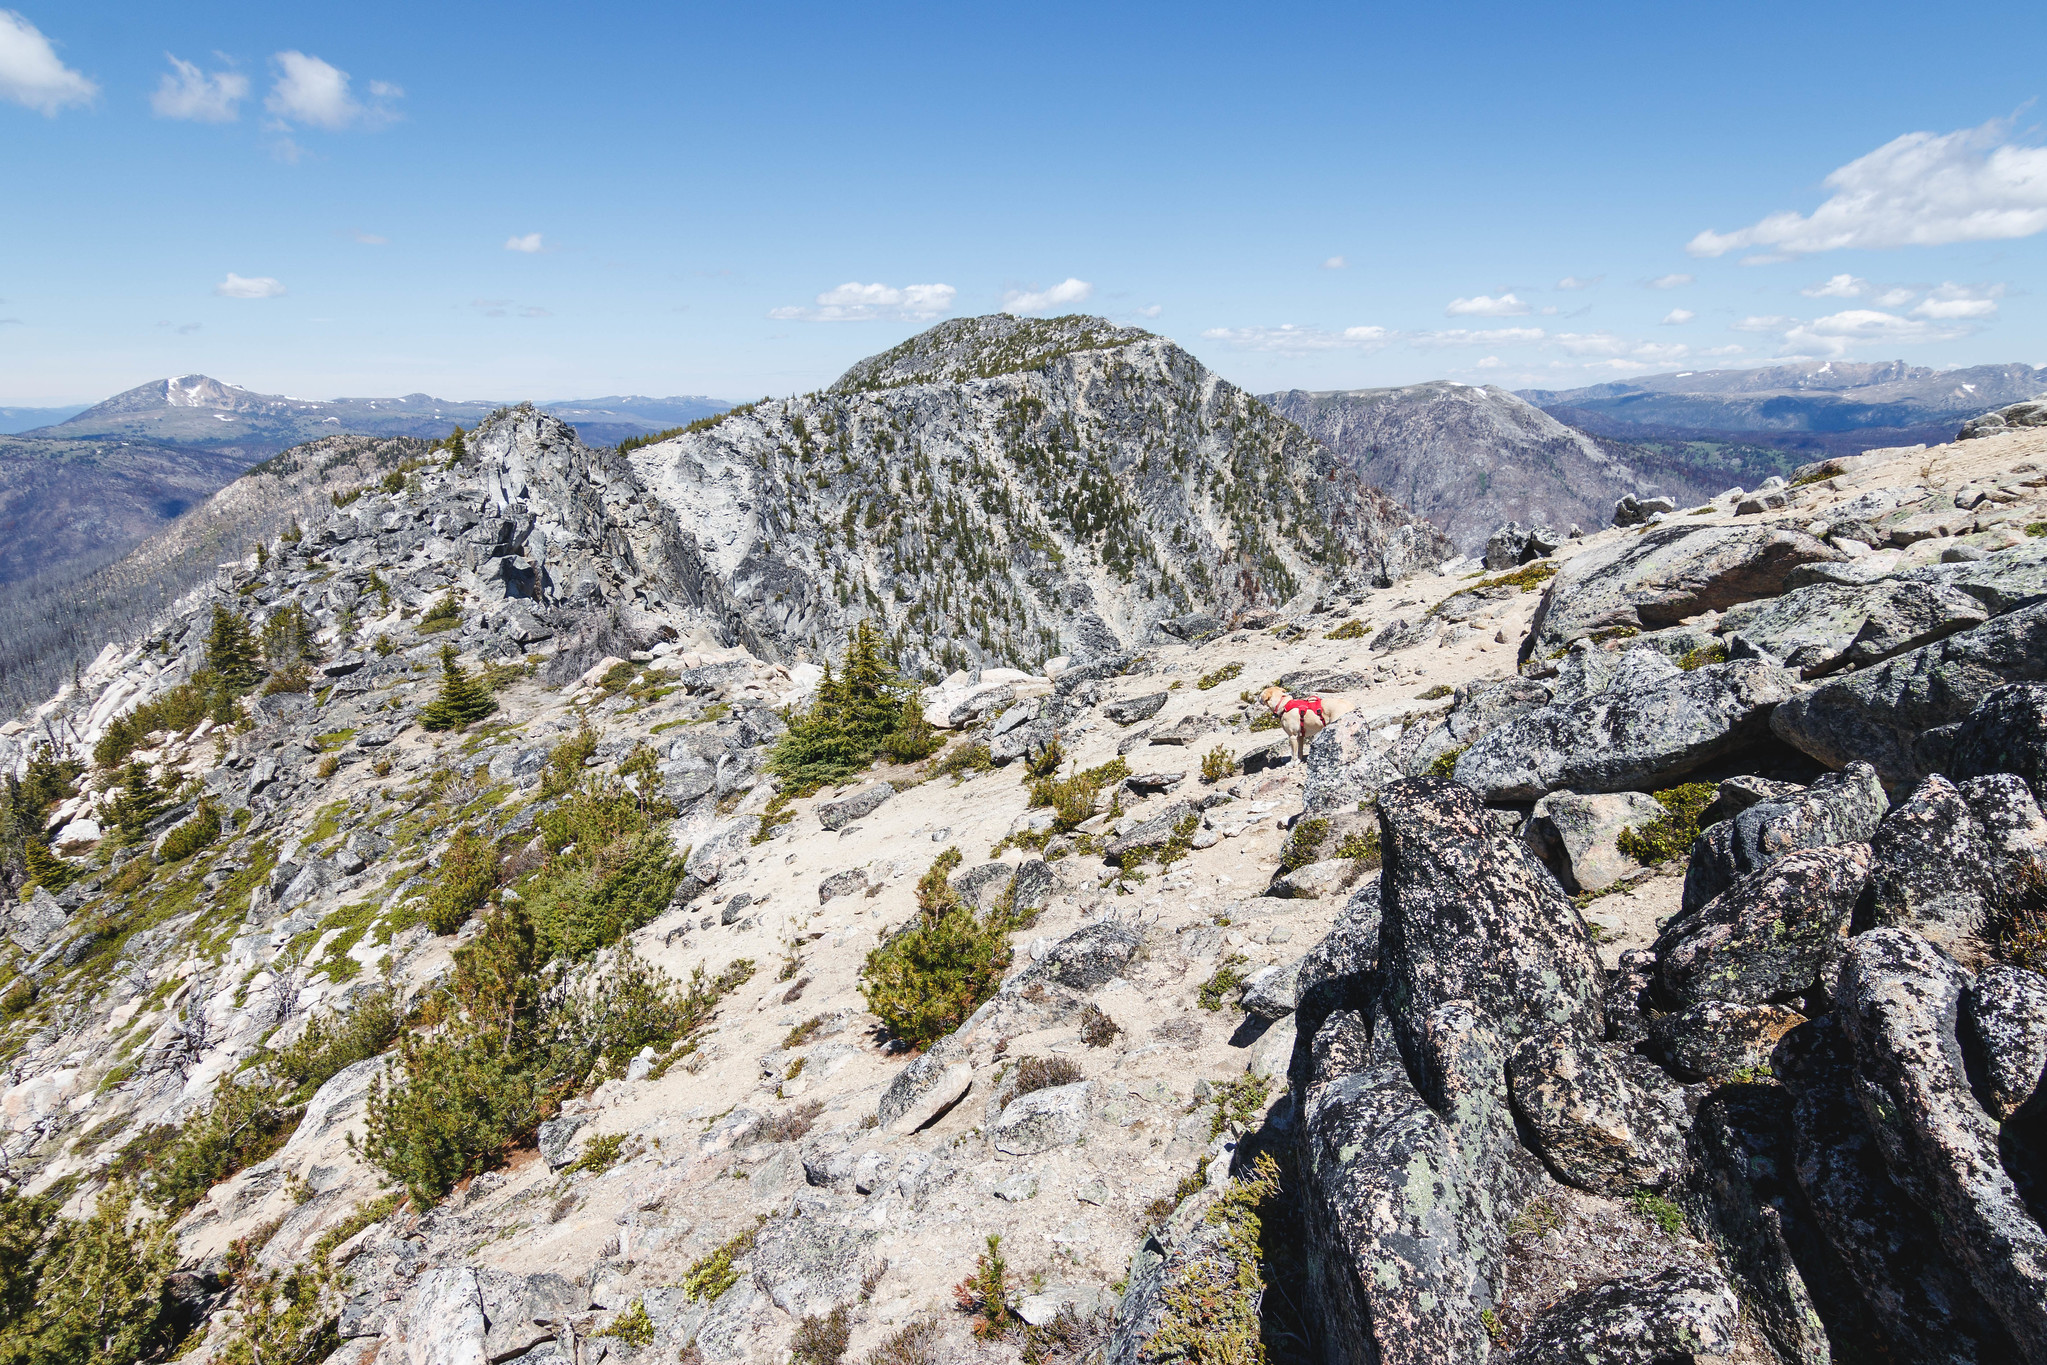 Freds Mountain within reach